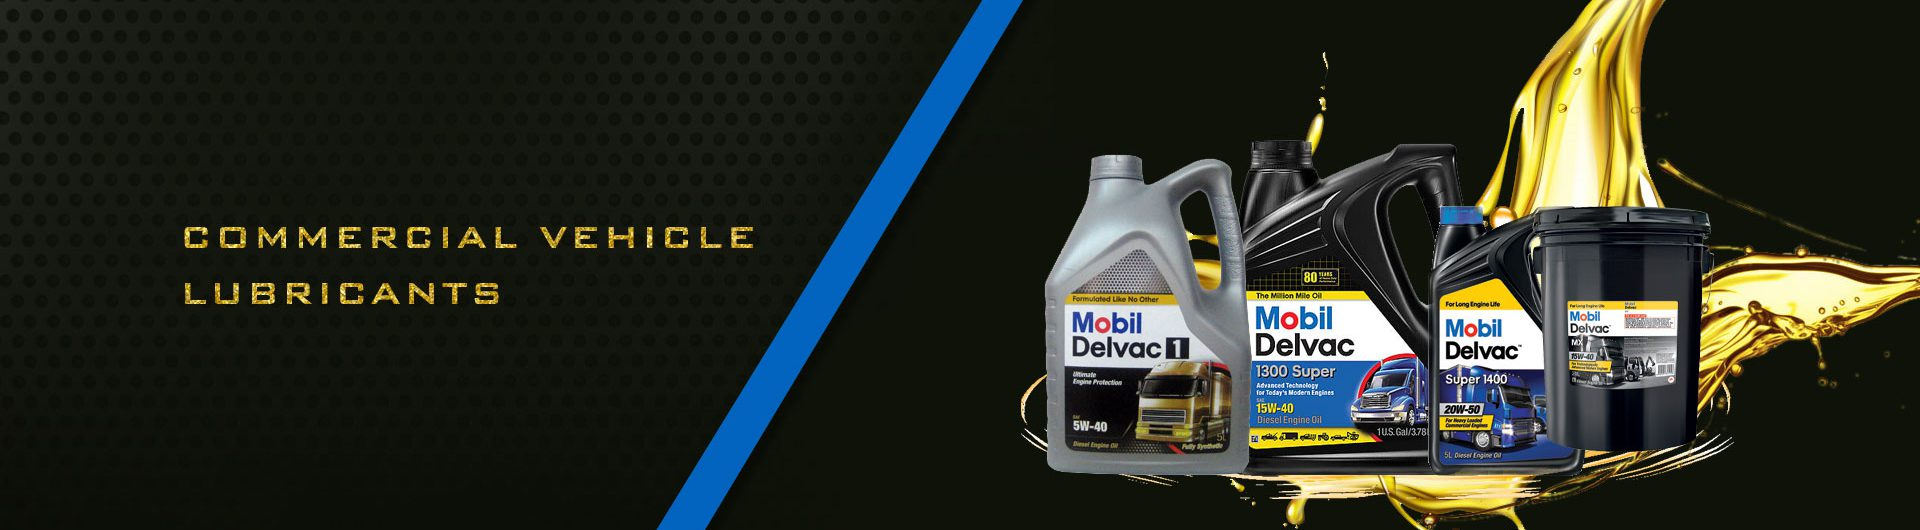 AKT Holdings, Mobil Myanmar, MJL & AKT Petroleum, Lubricants